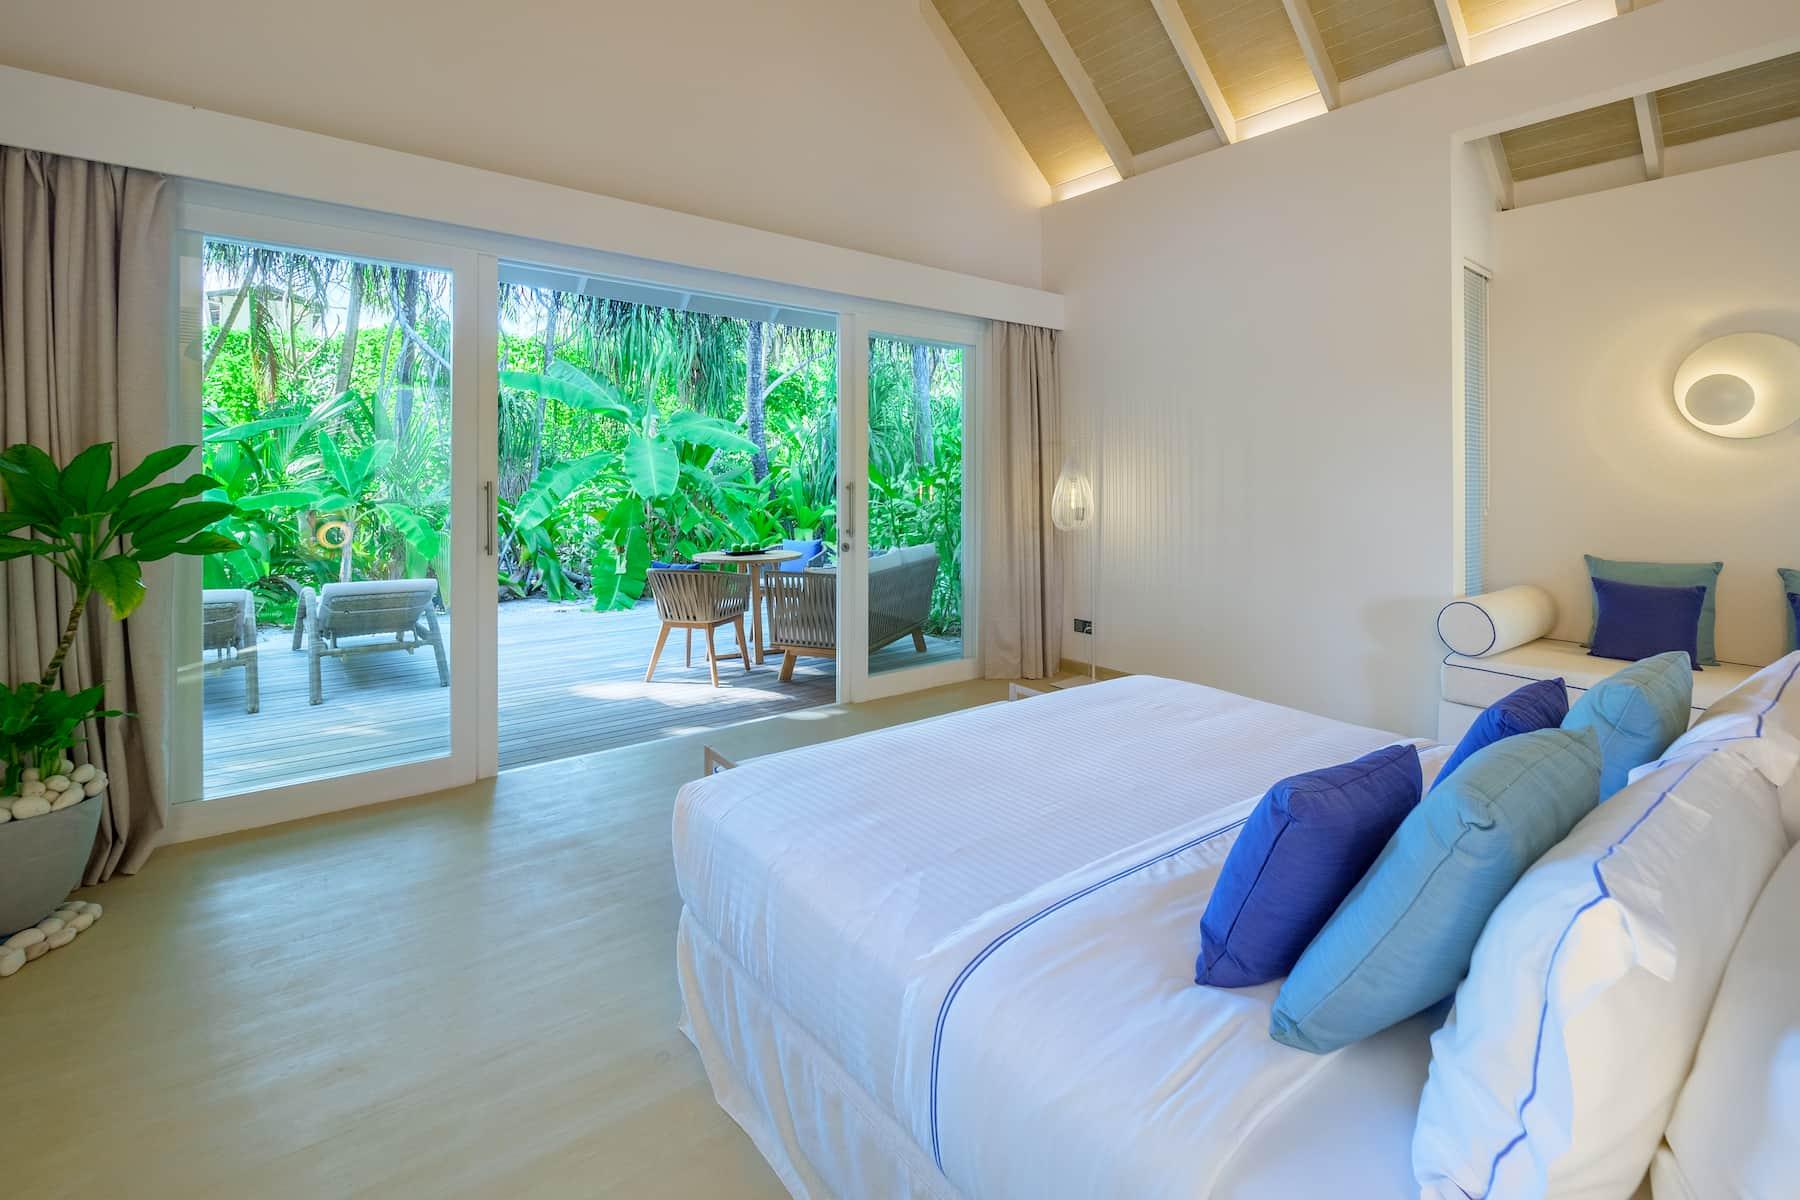 Resort Maldive Baglioni Resort garden villa